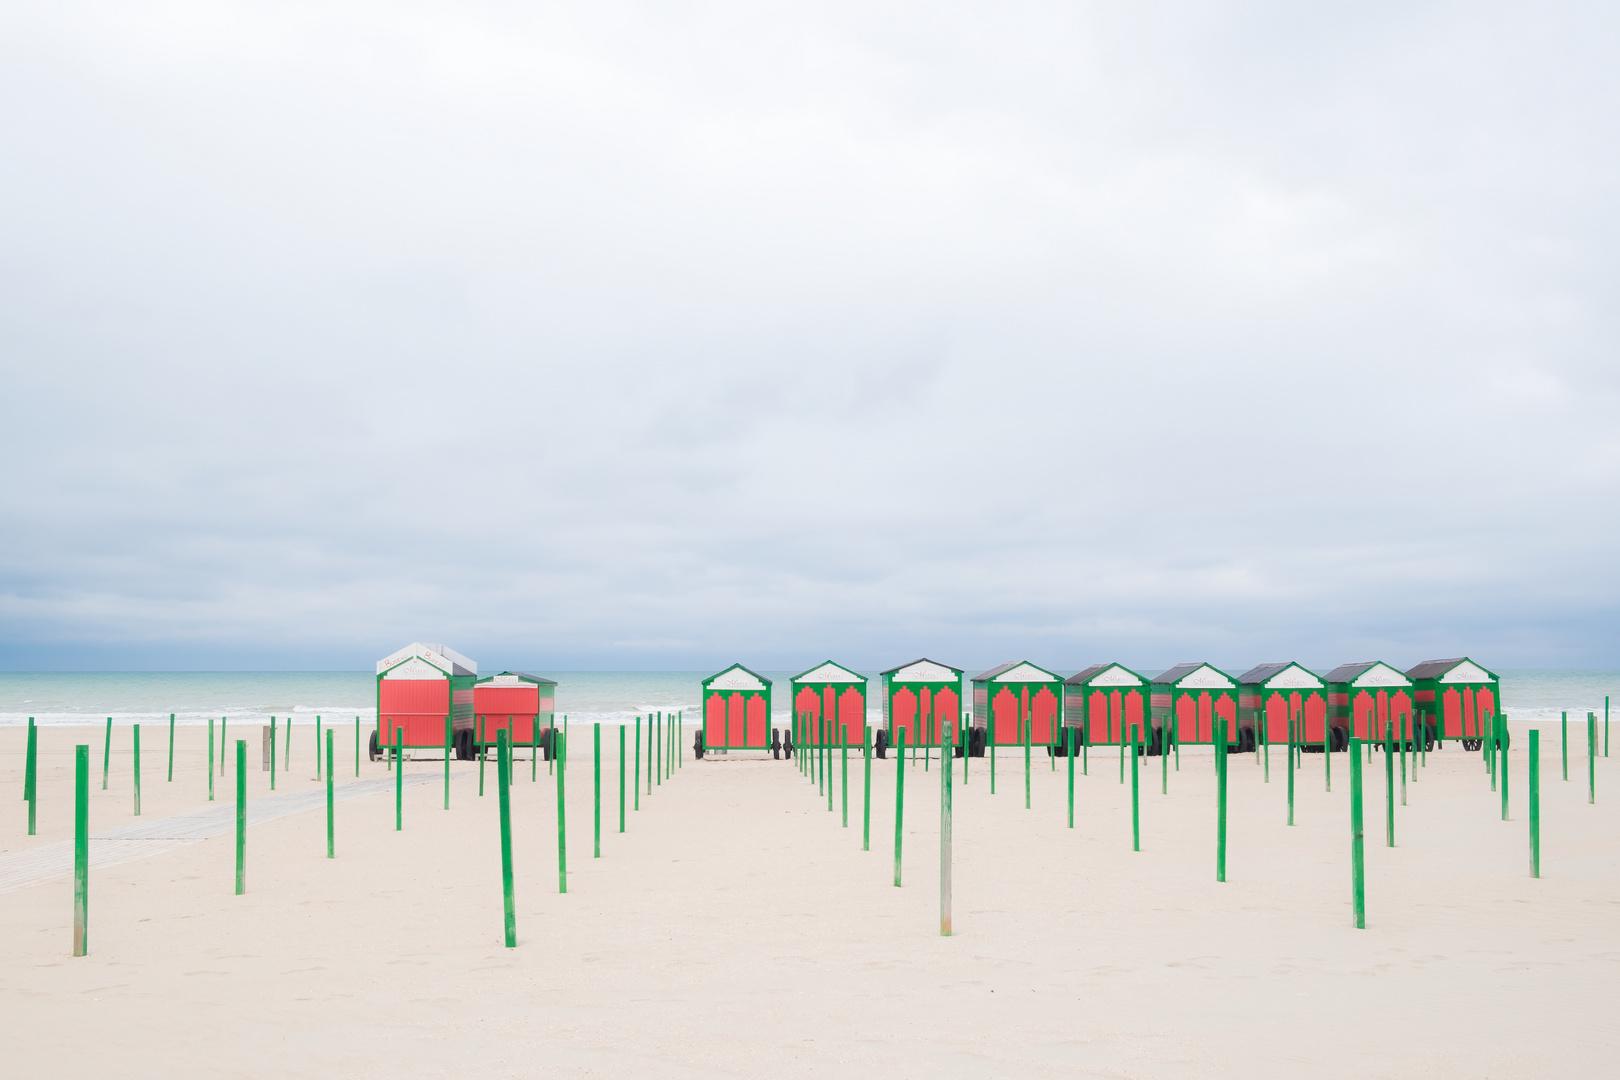 Strandhäuser in Belgien